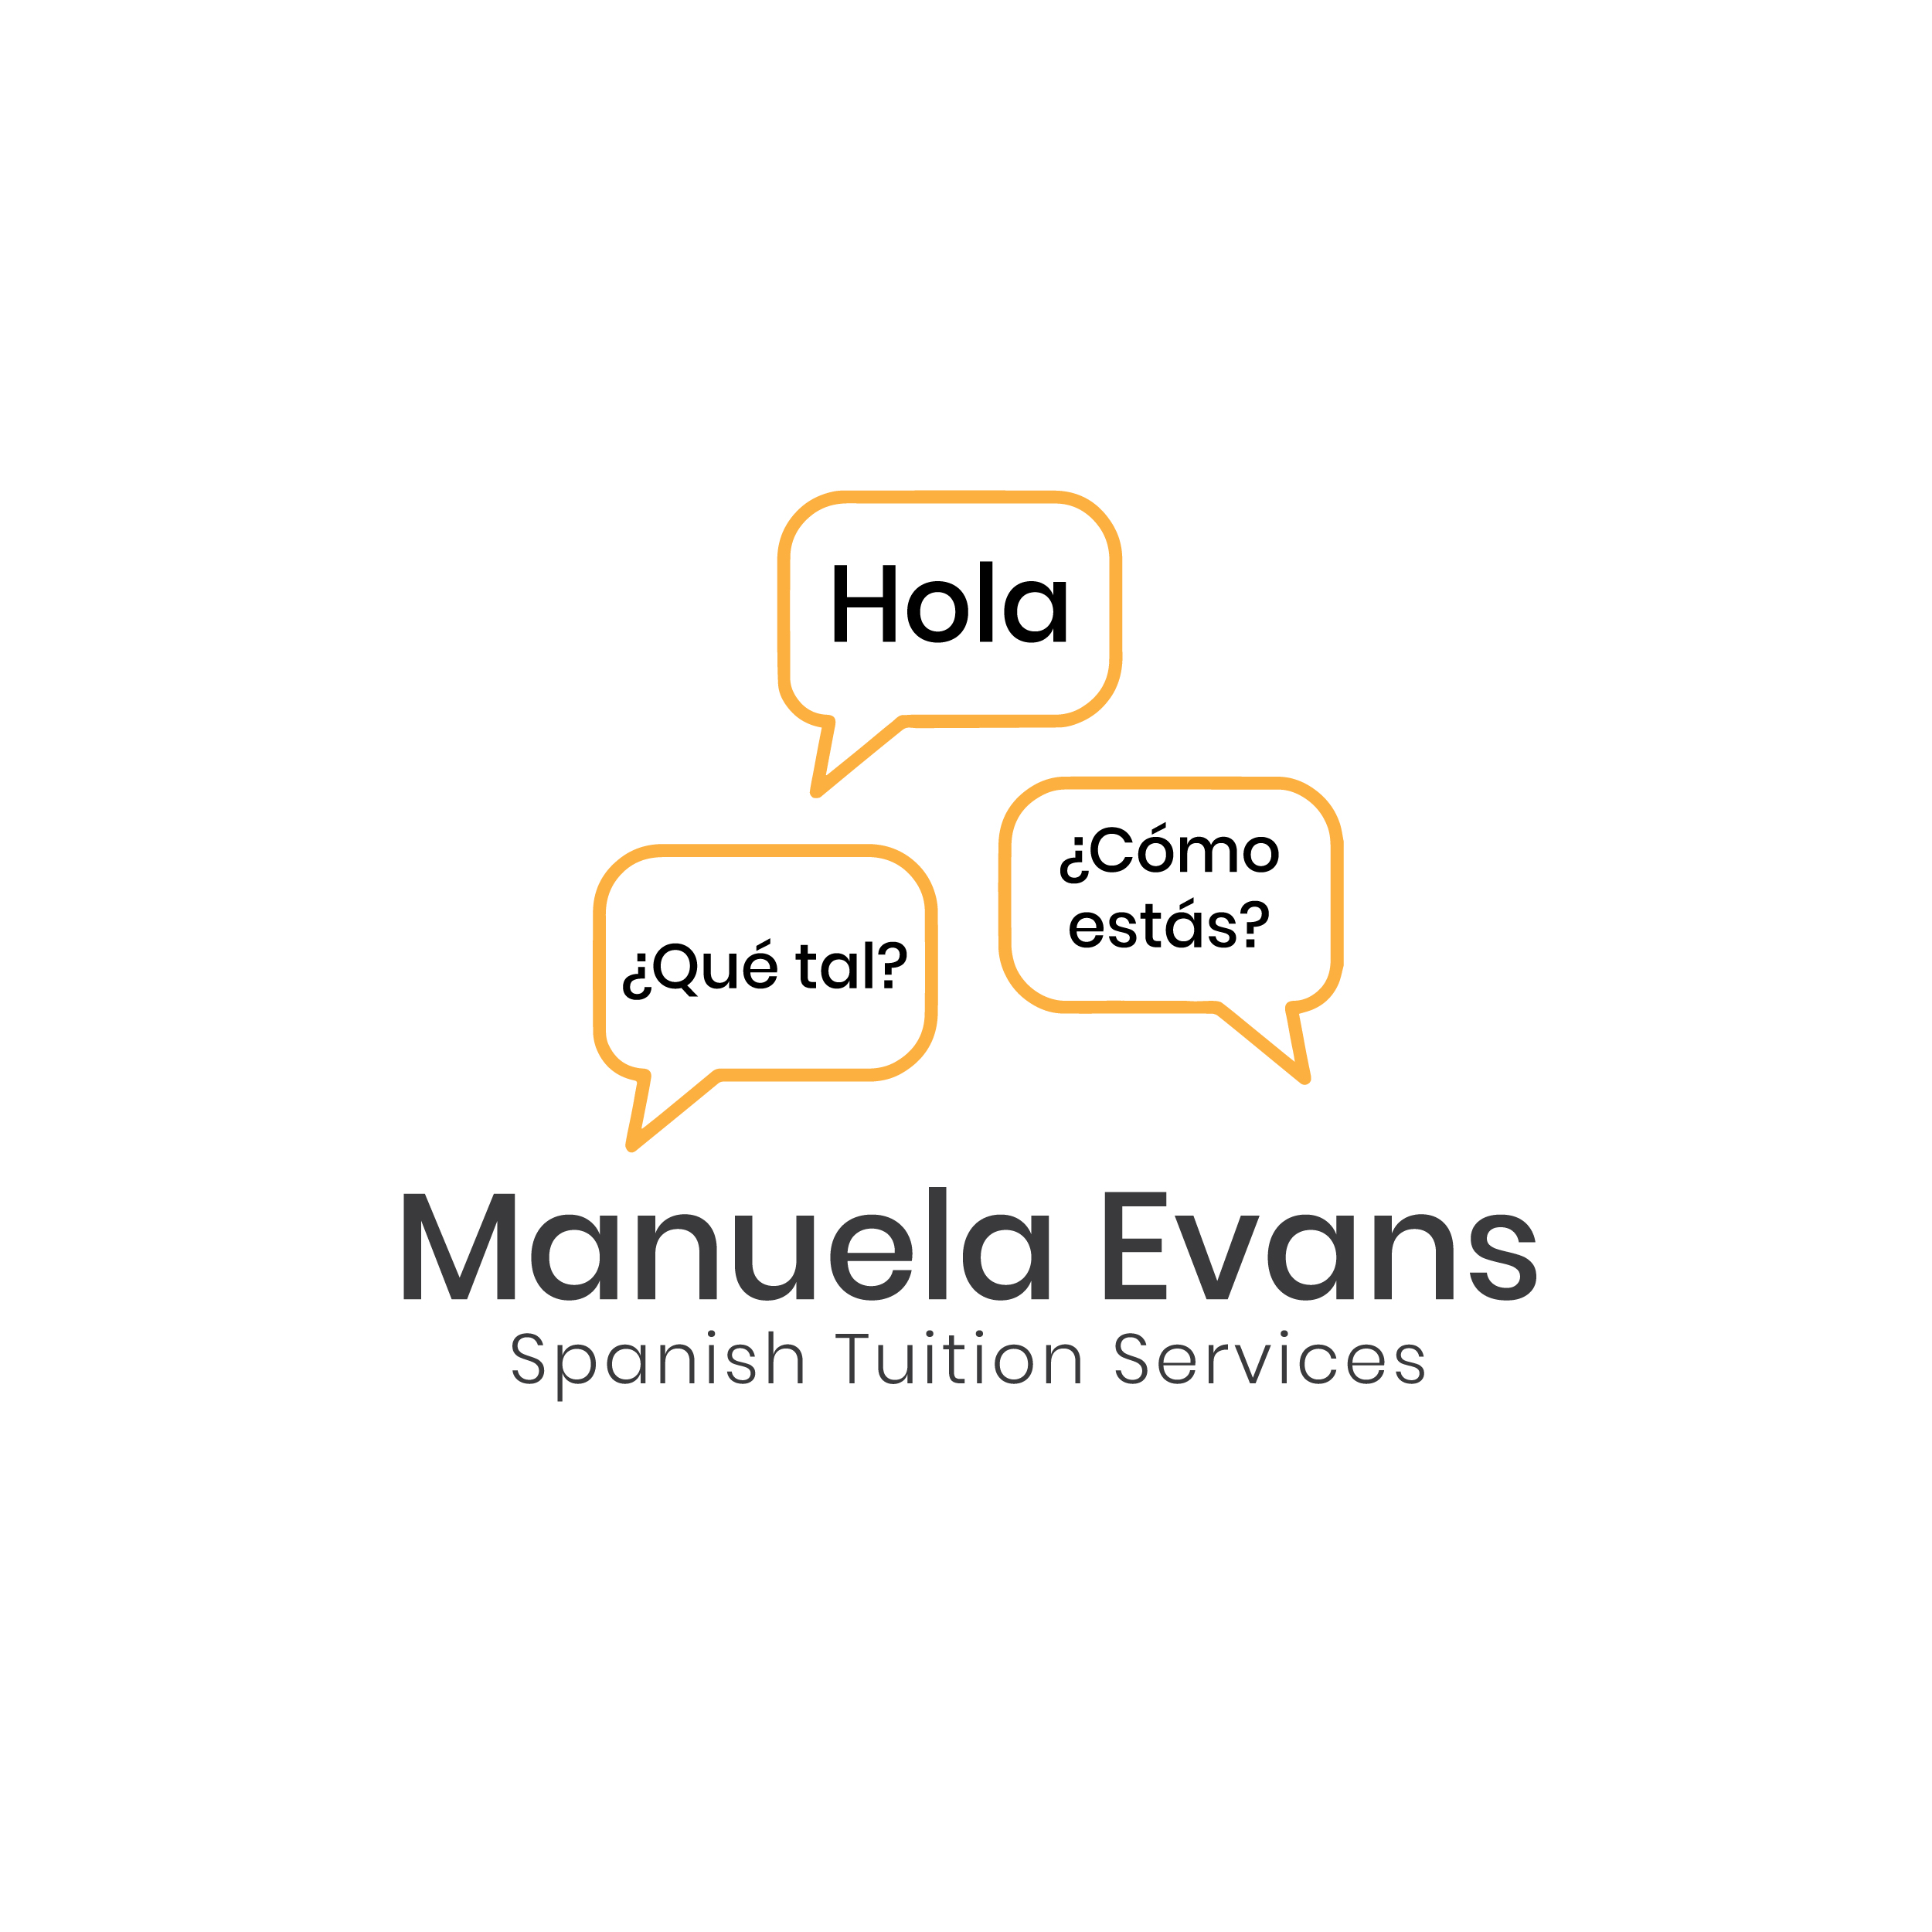 Manuela Evans, Spanish Tuition Services